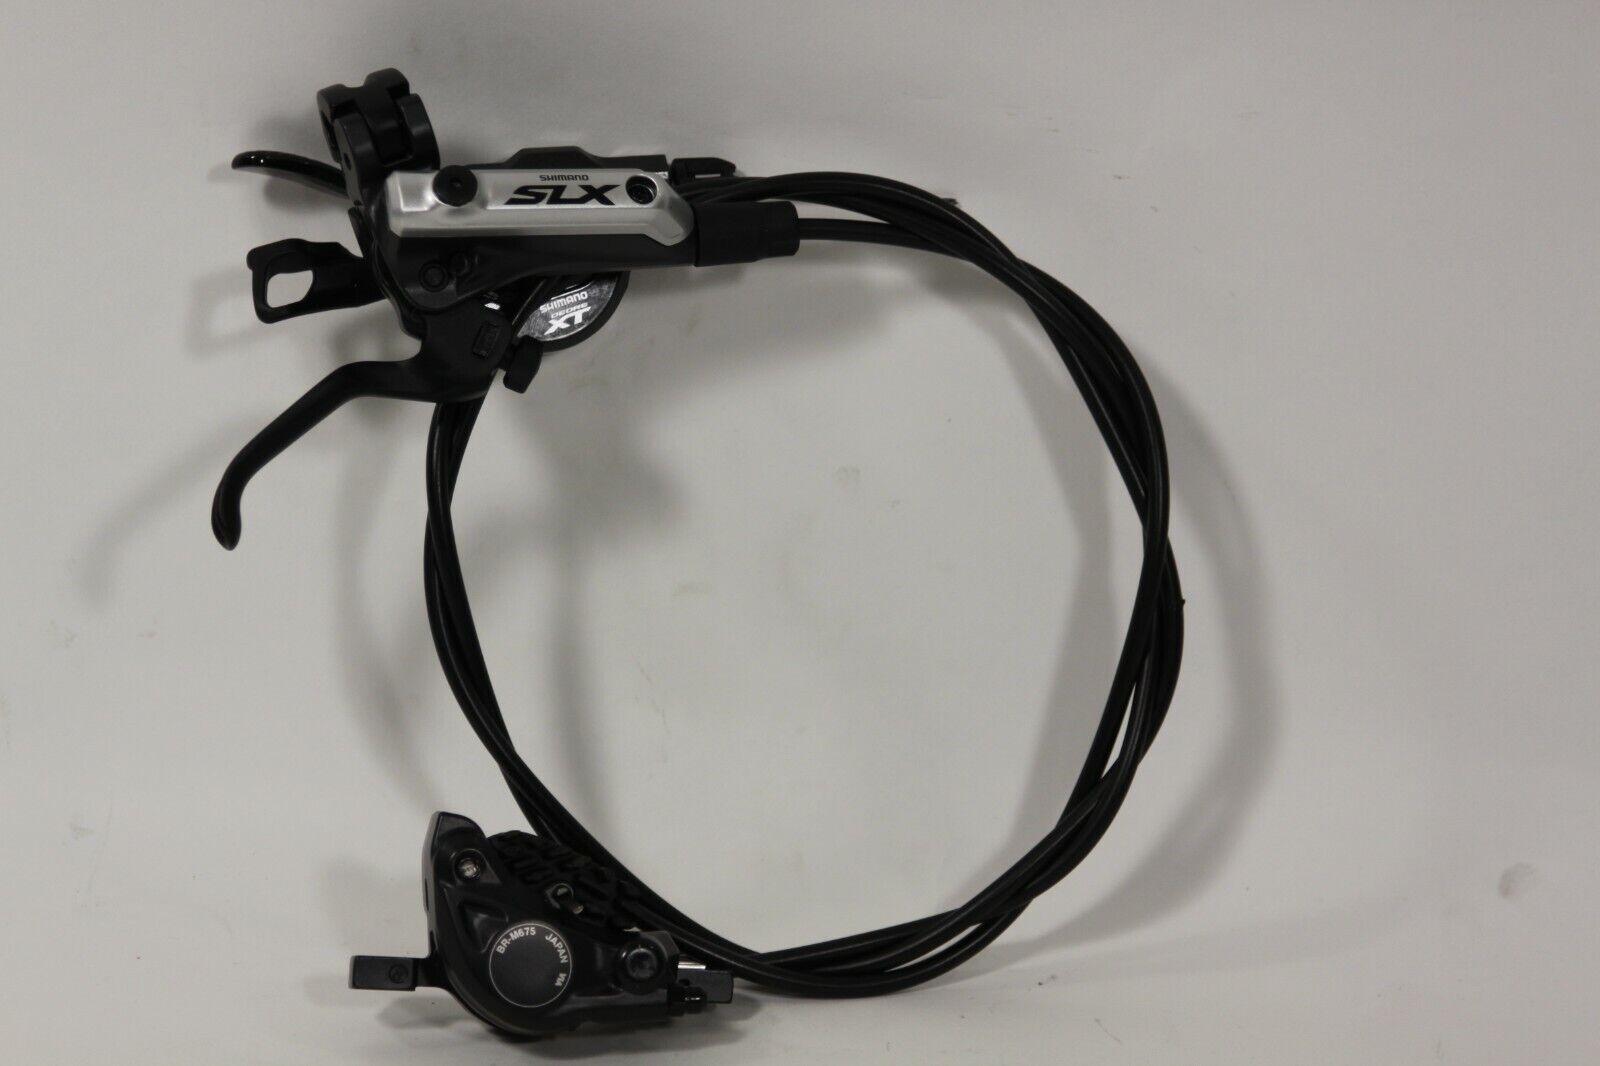 Shimano SLX BL M675-B Front Hydro Brake with XT M8000 11sp shifter